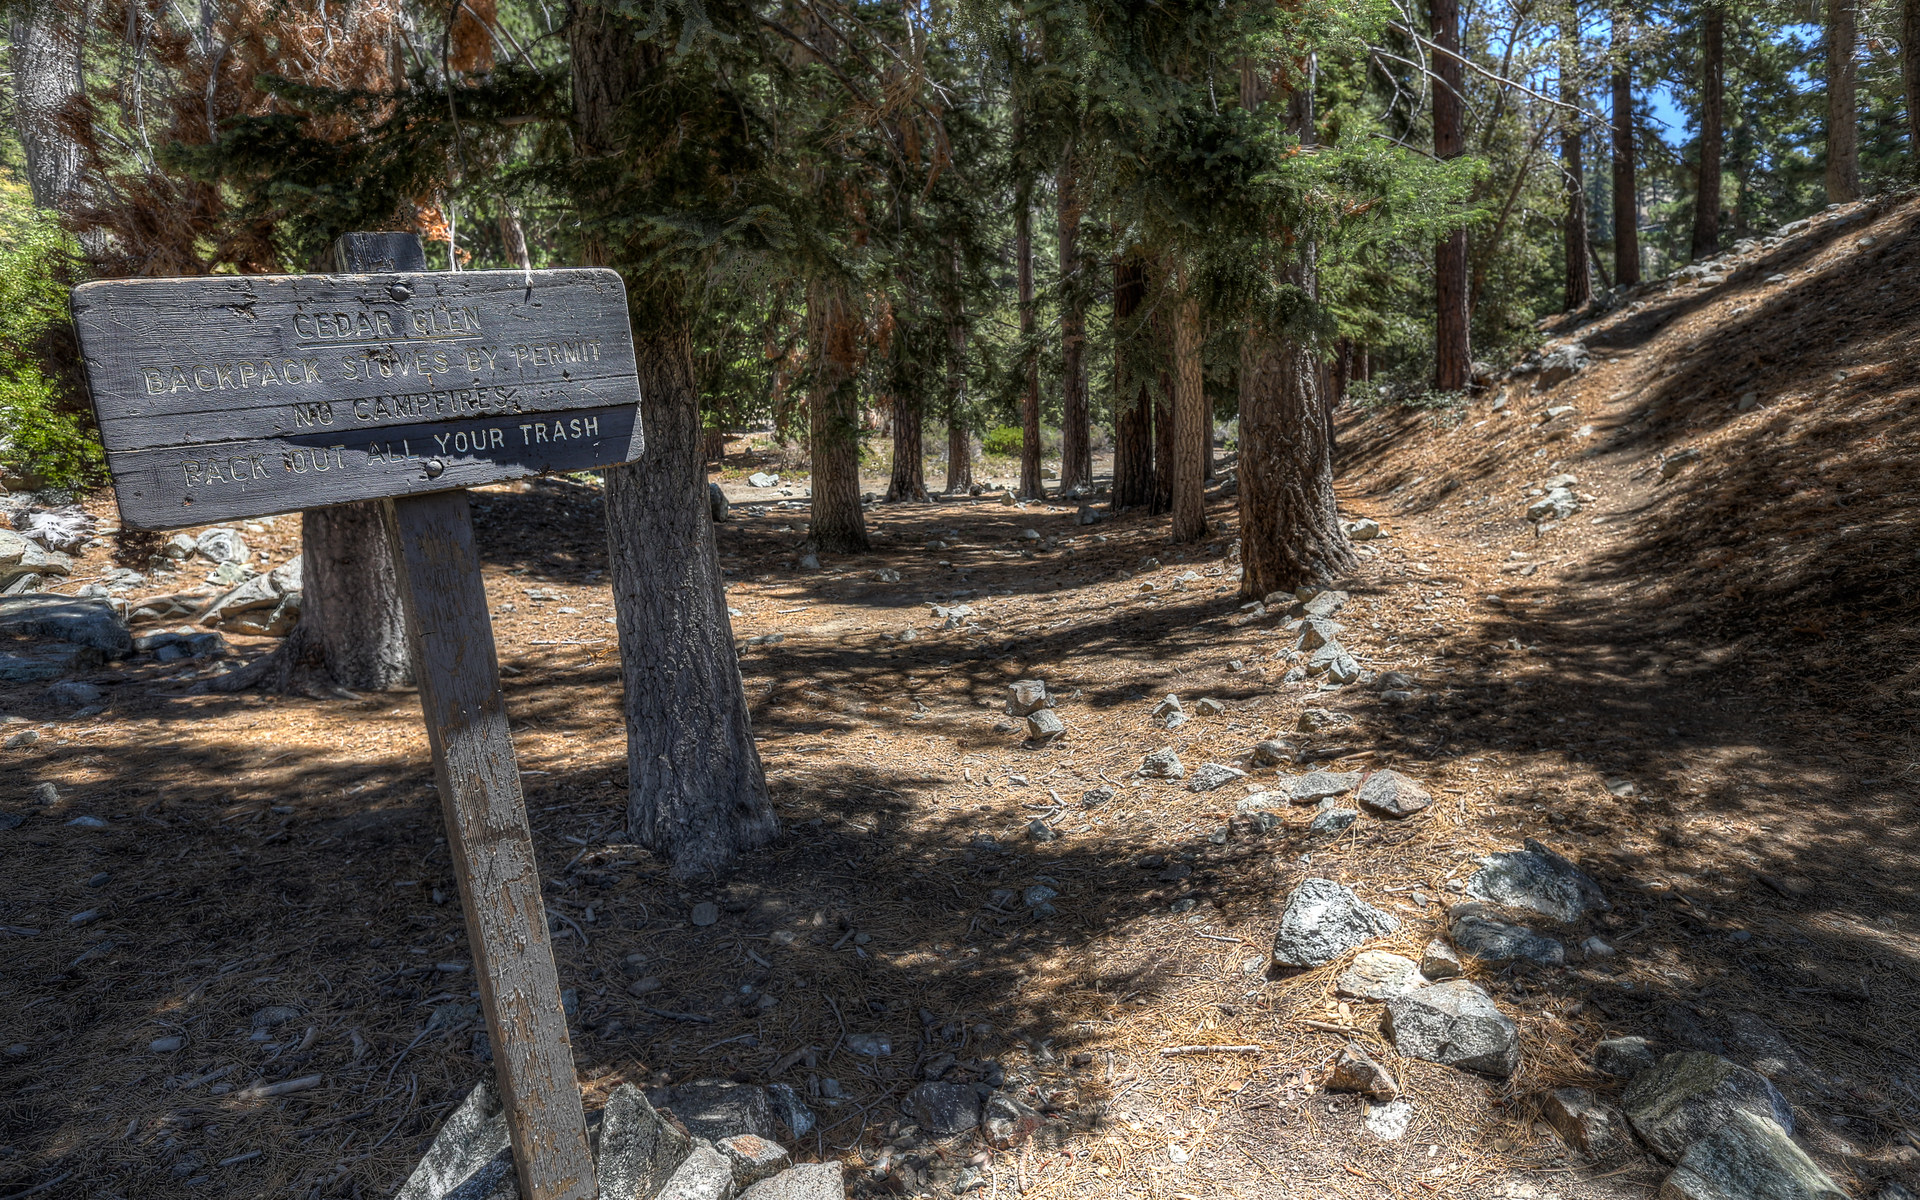 Cedars camp ground